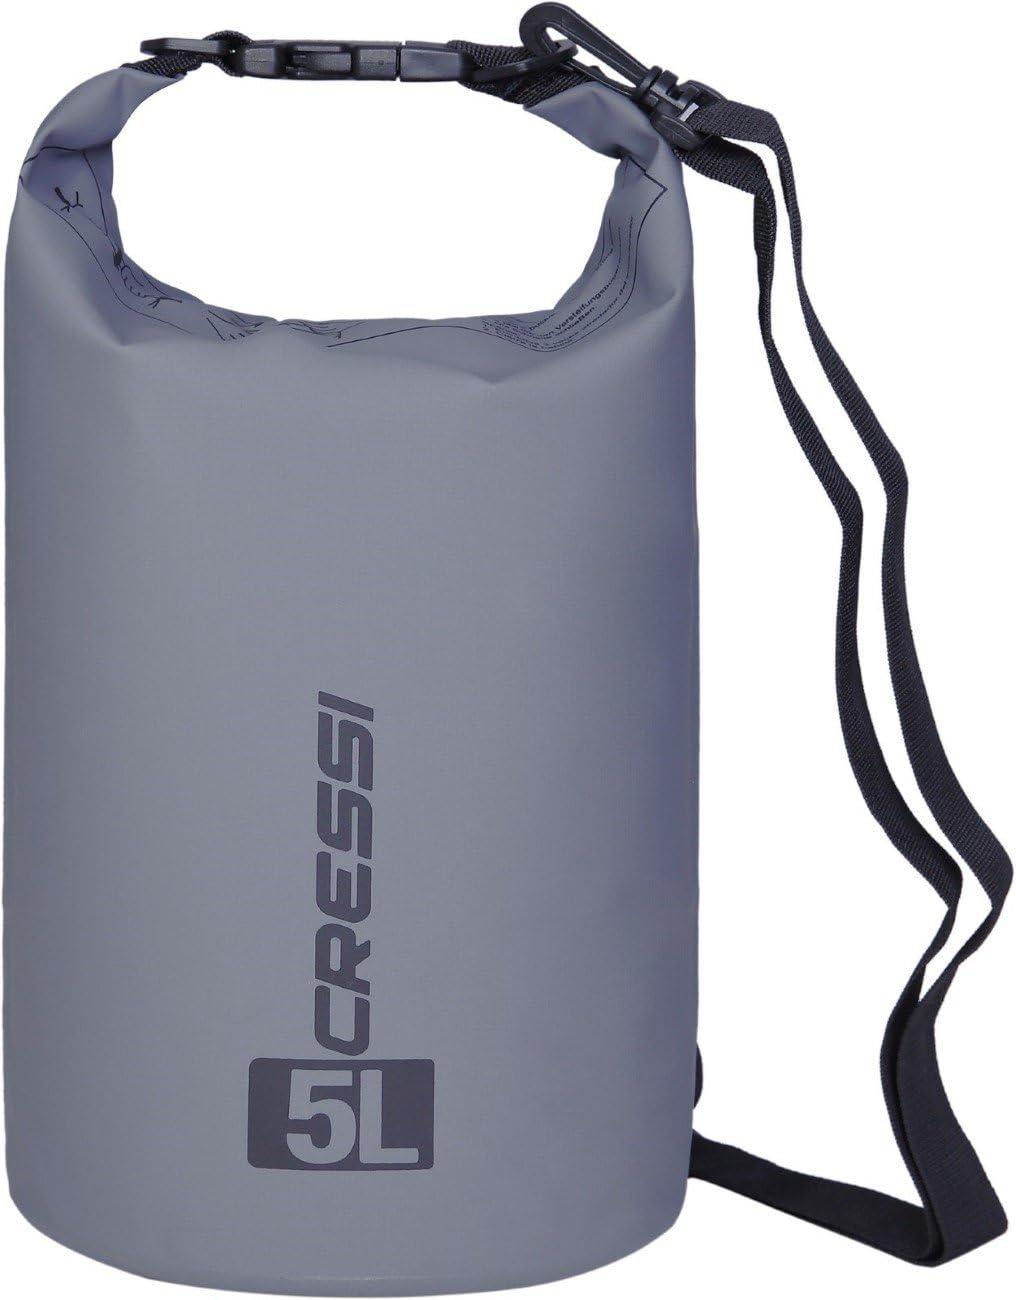 Cressi Waterproof Dry Bag Waterproof Case for Cell Phones//Smartphones Black